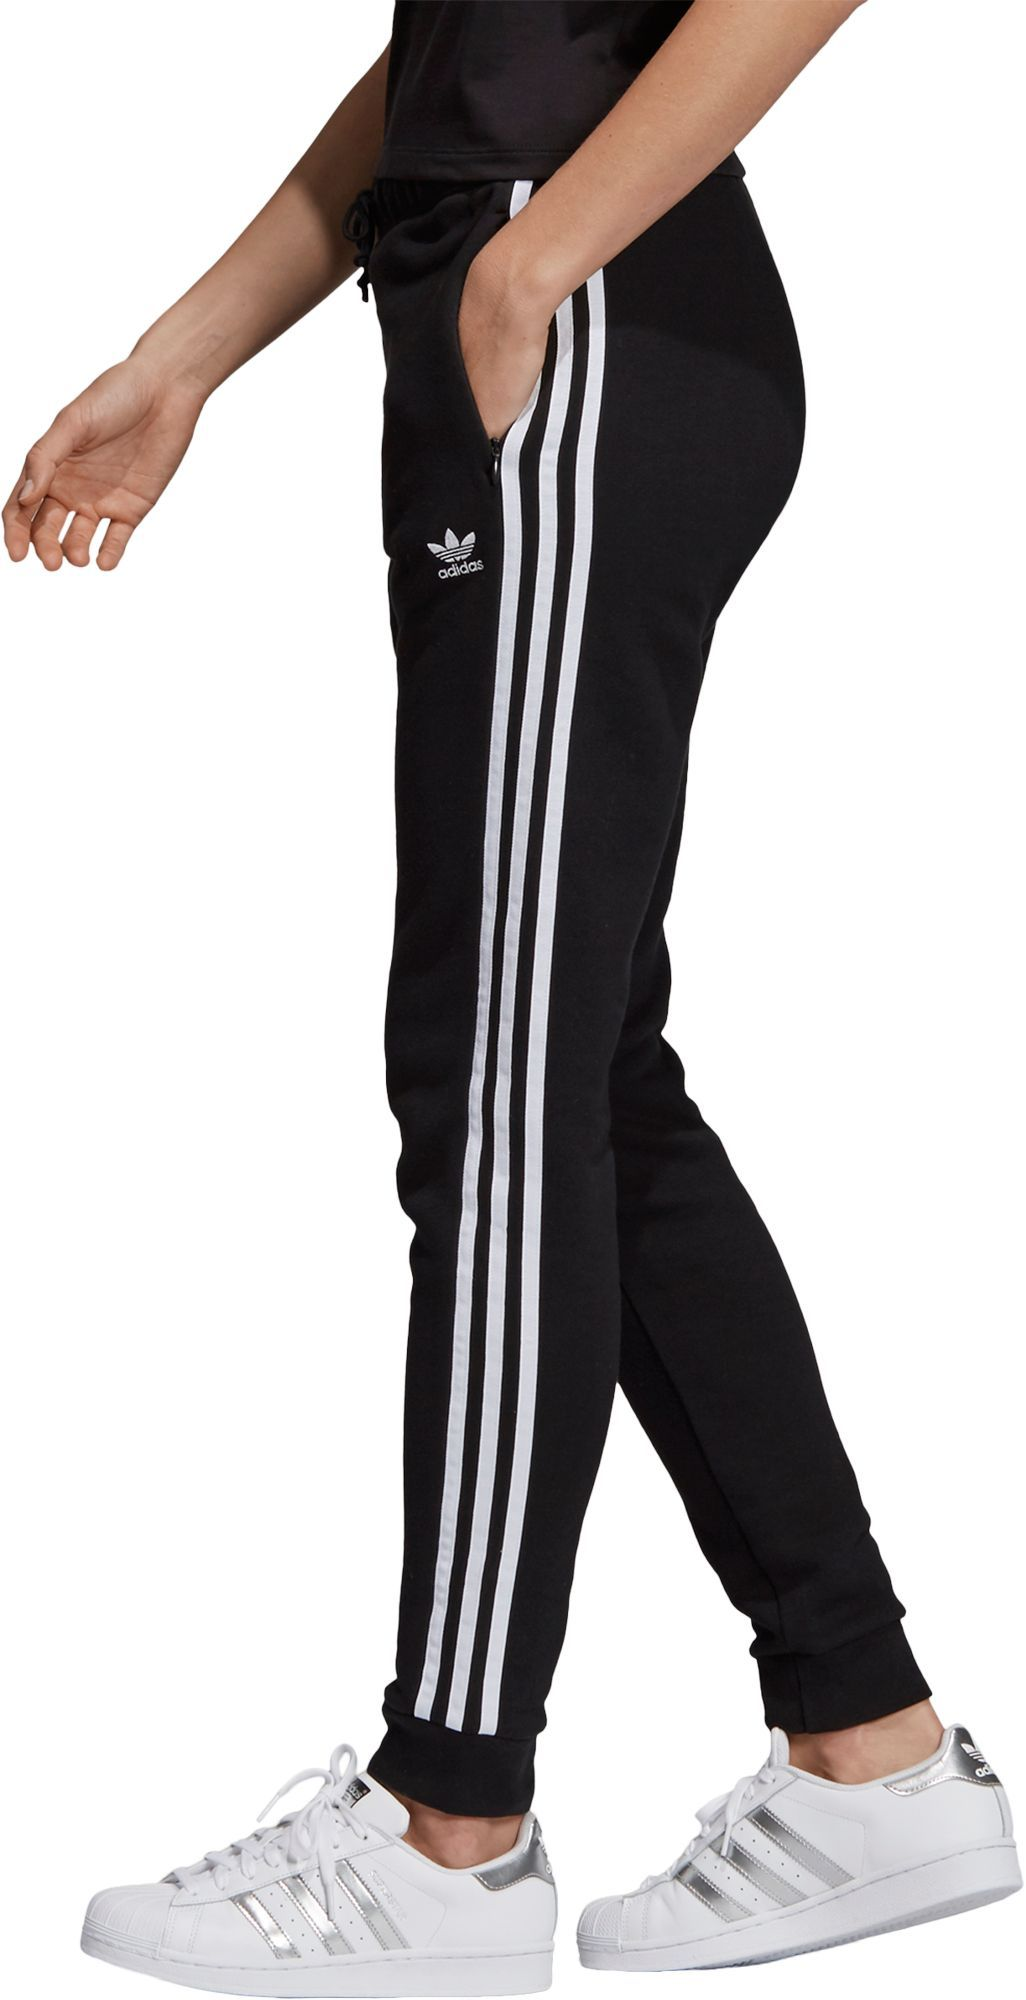 Track pants women, Adidas pants women